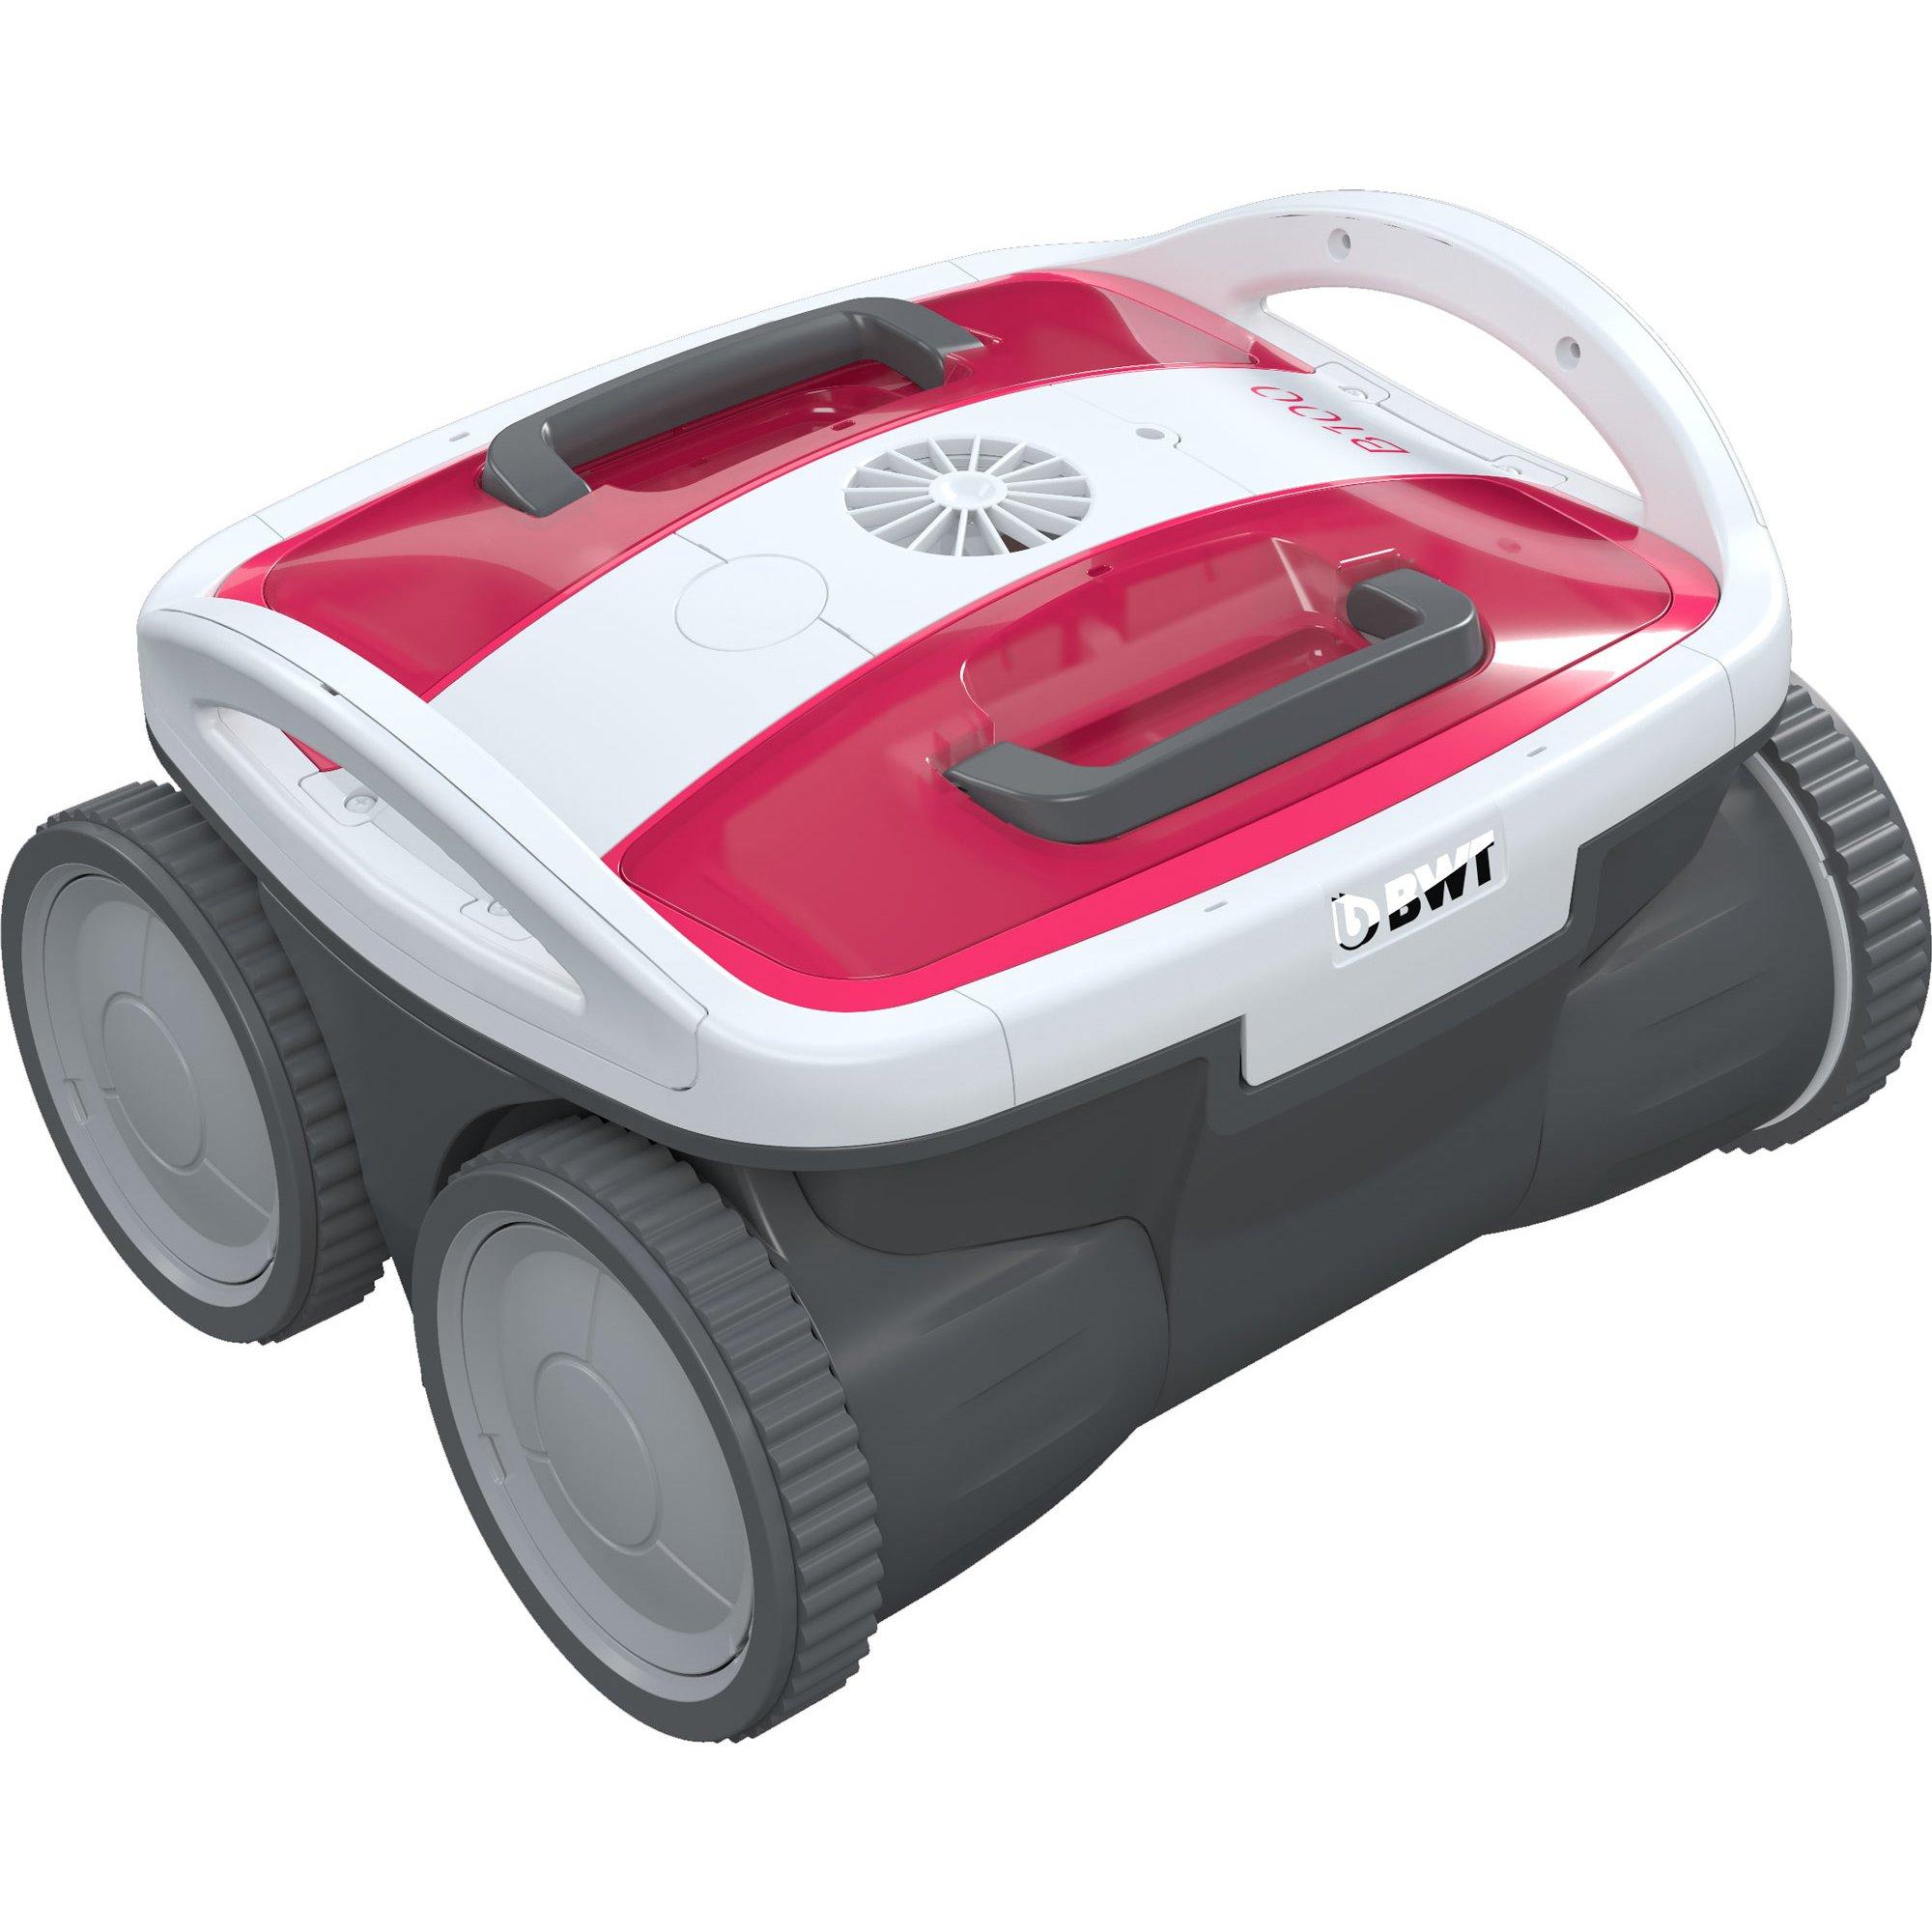 BWT B100 poolrobot